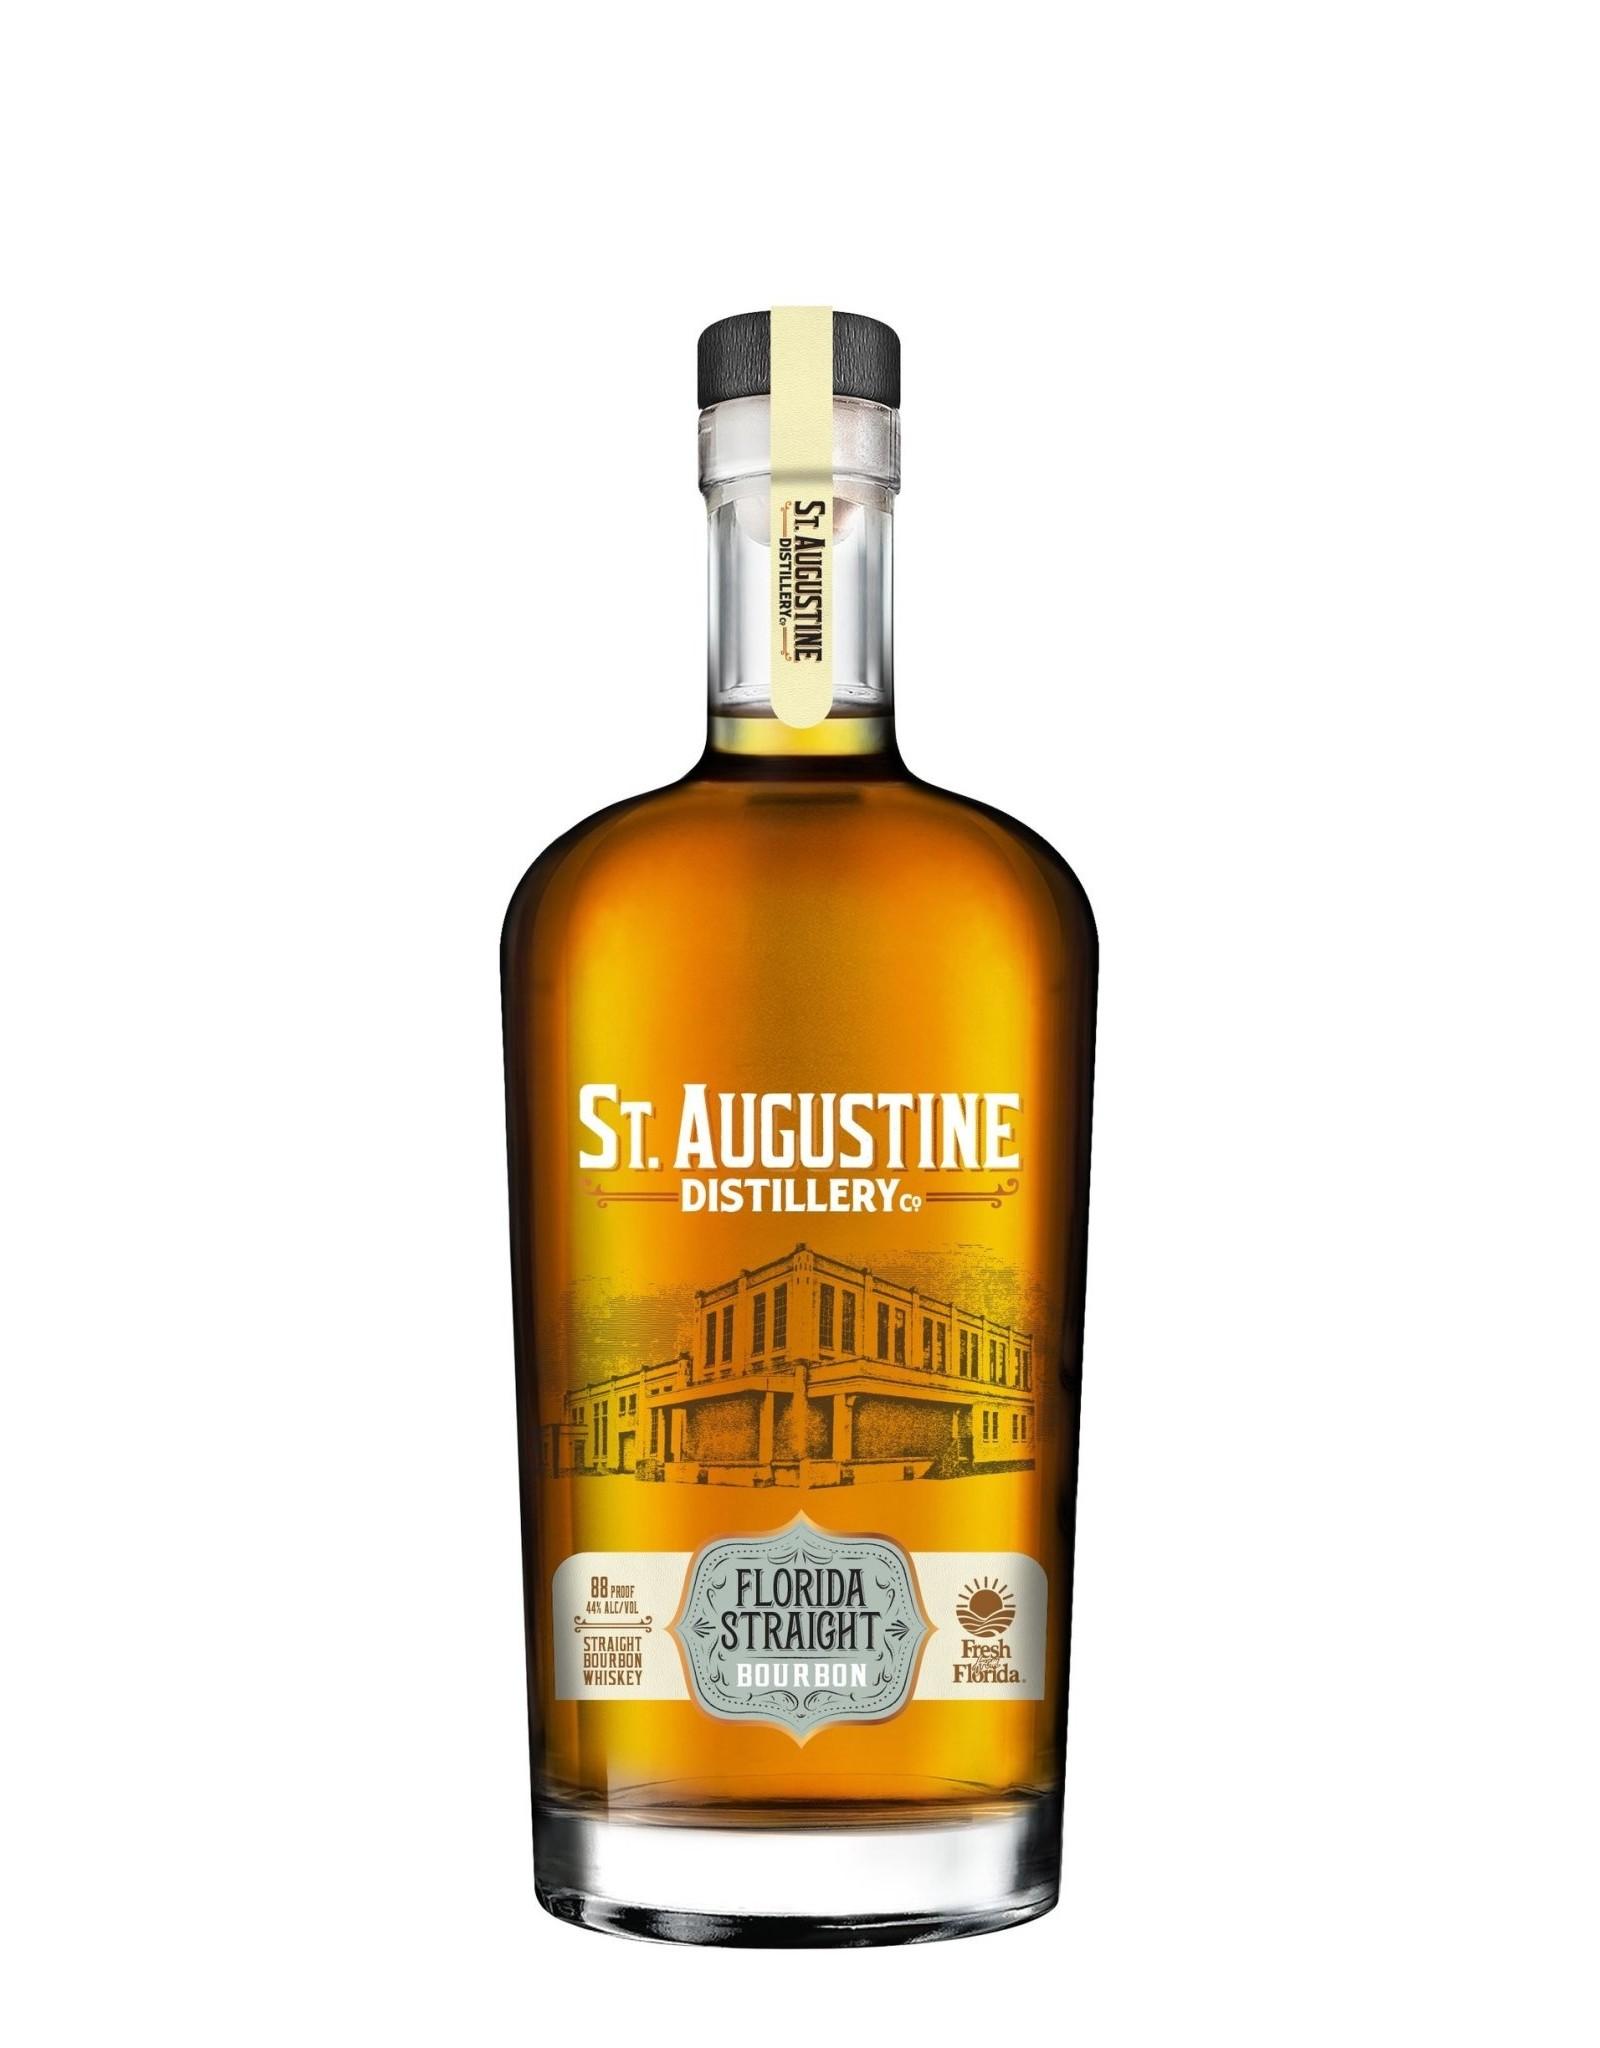 St. Augustine Florida Straight Bourbon